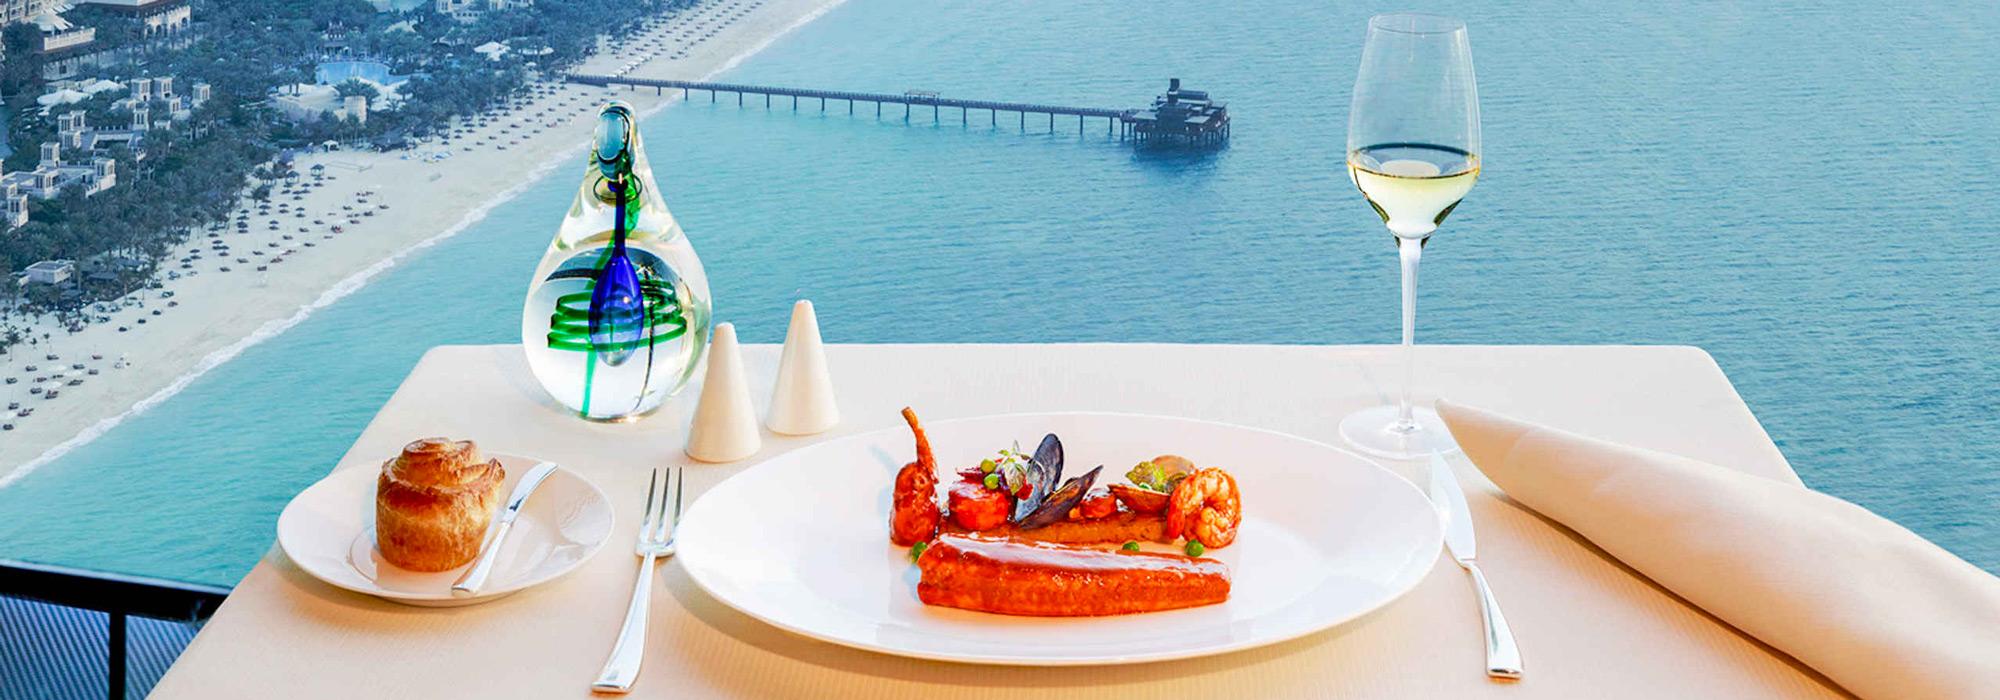 Restaurants im Burj al Arab